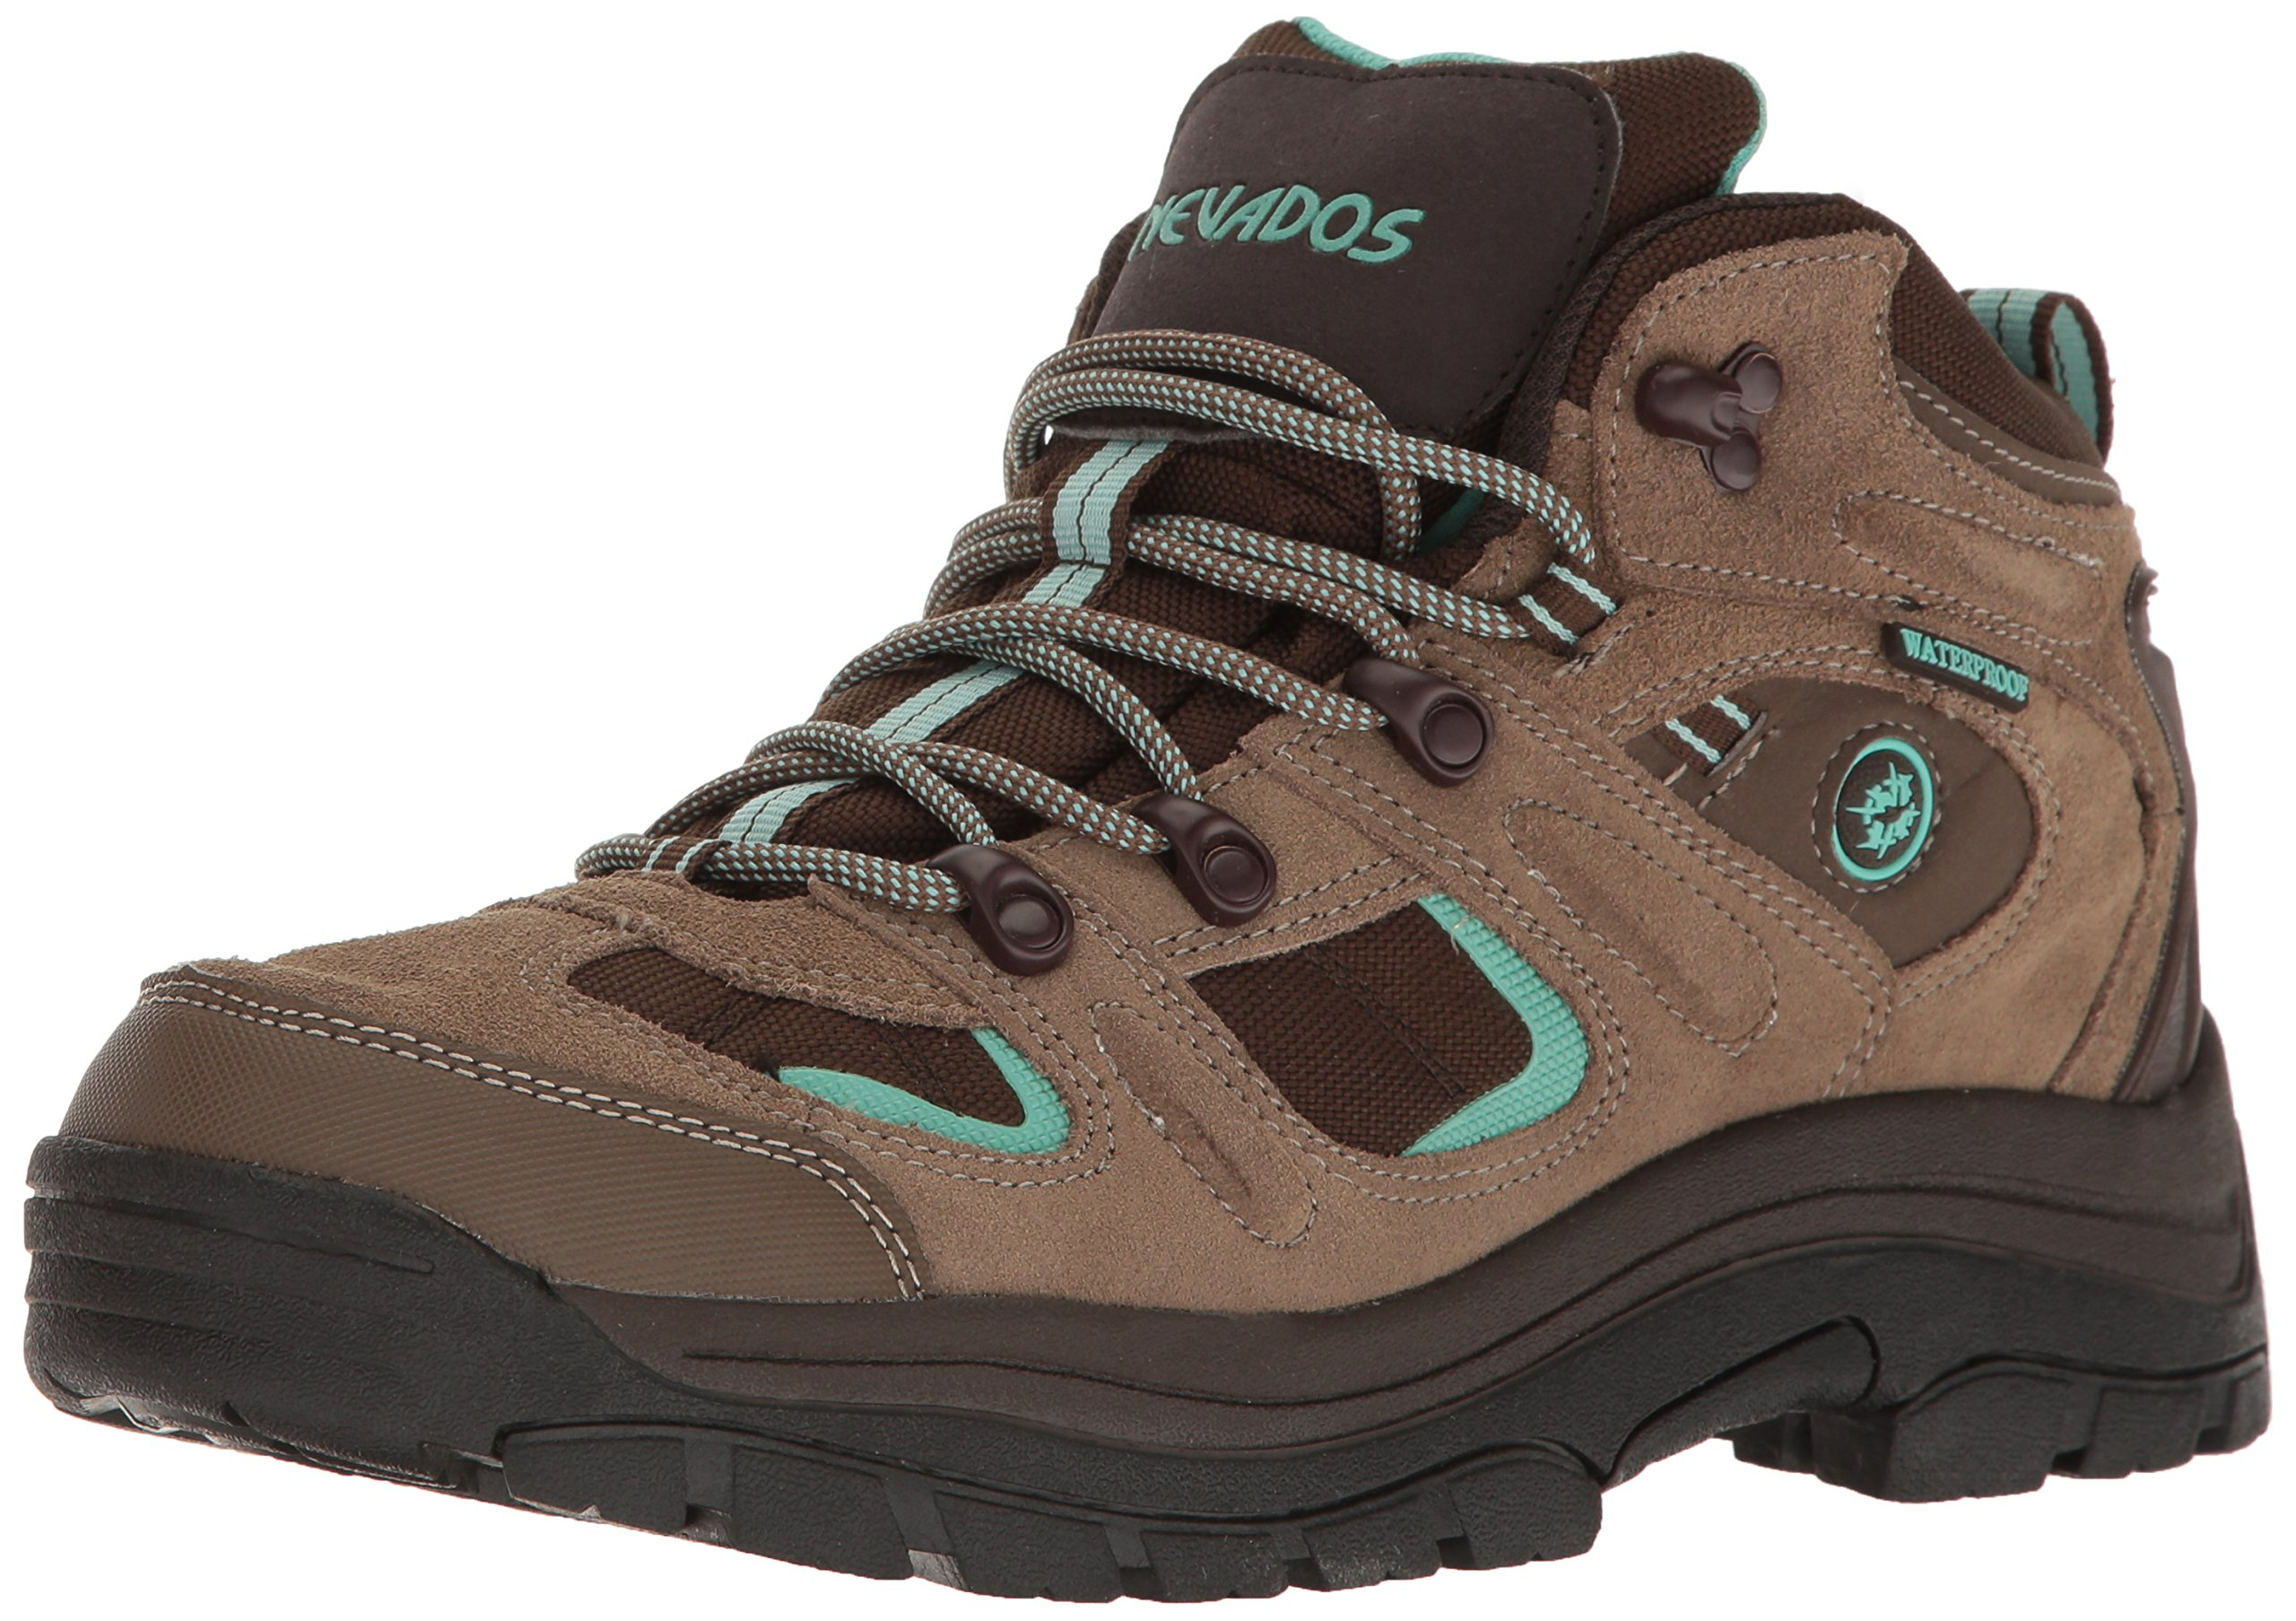 Nevados Women's Klondike Mid Waterproof Hiking Boot,Shiitake Brown/Dark Chestnut/Vivid Aqua,9 M US by Nevados